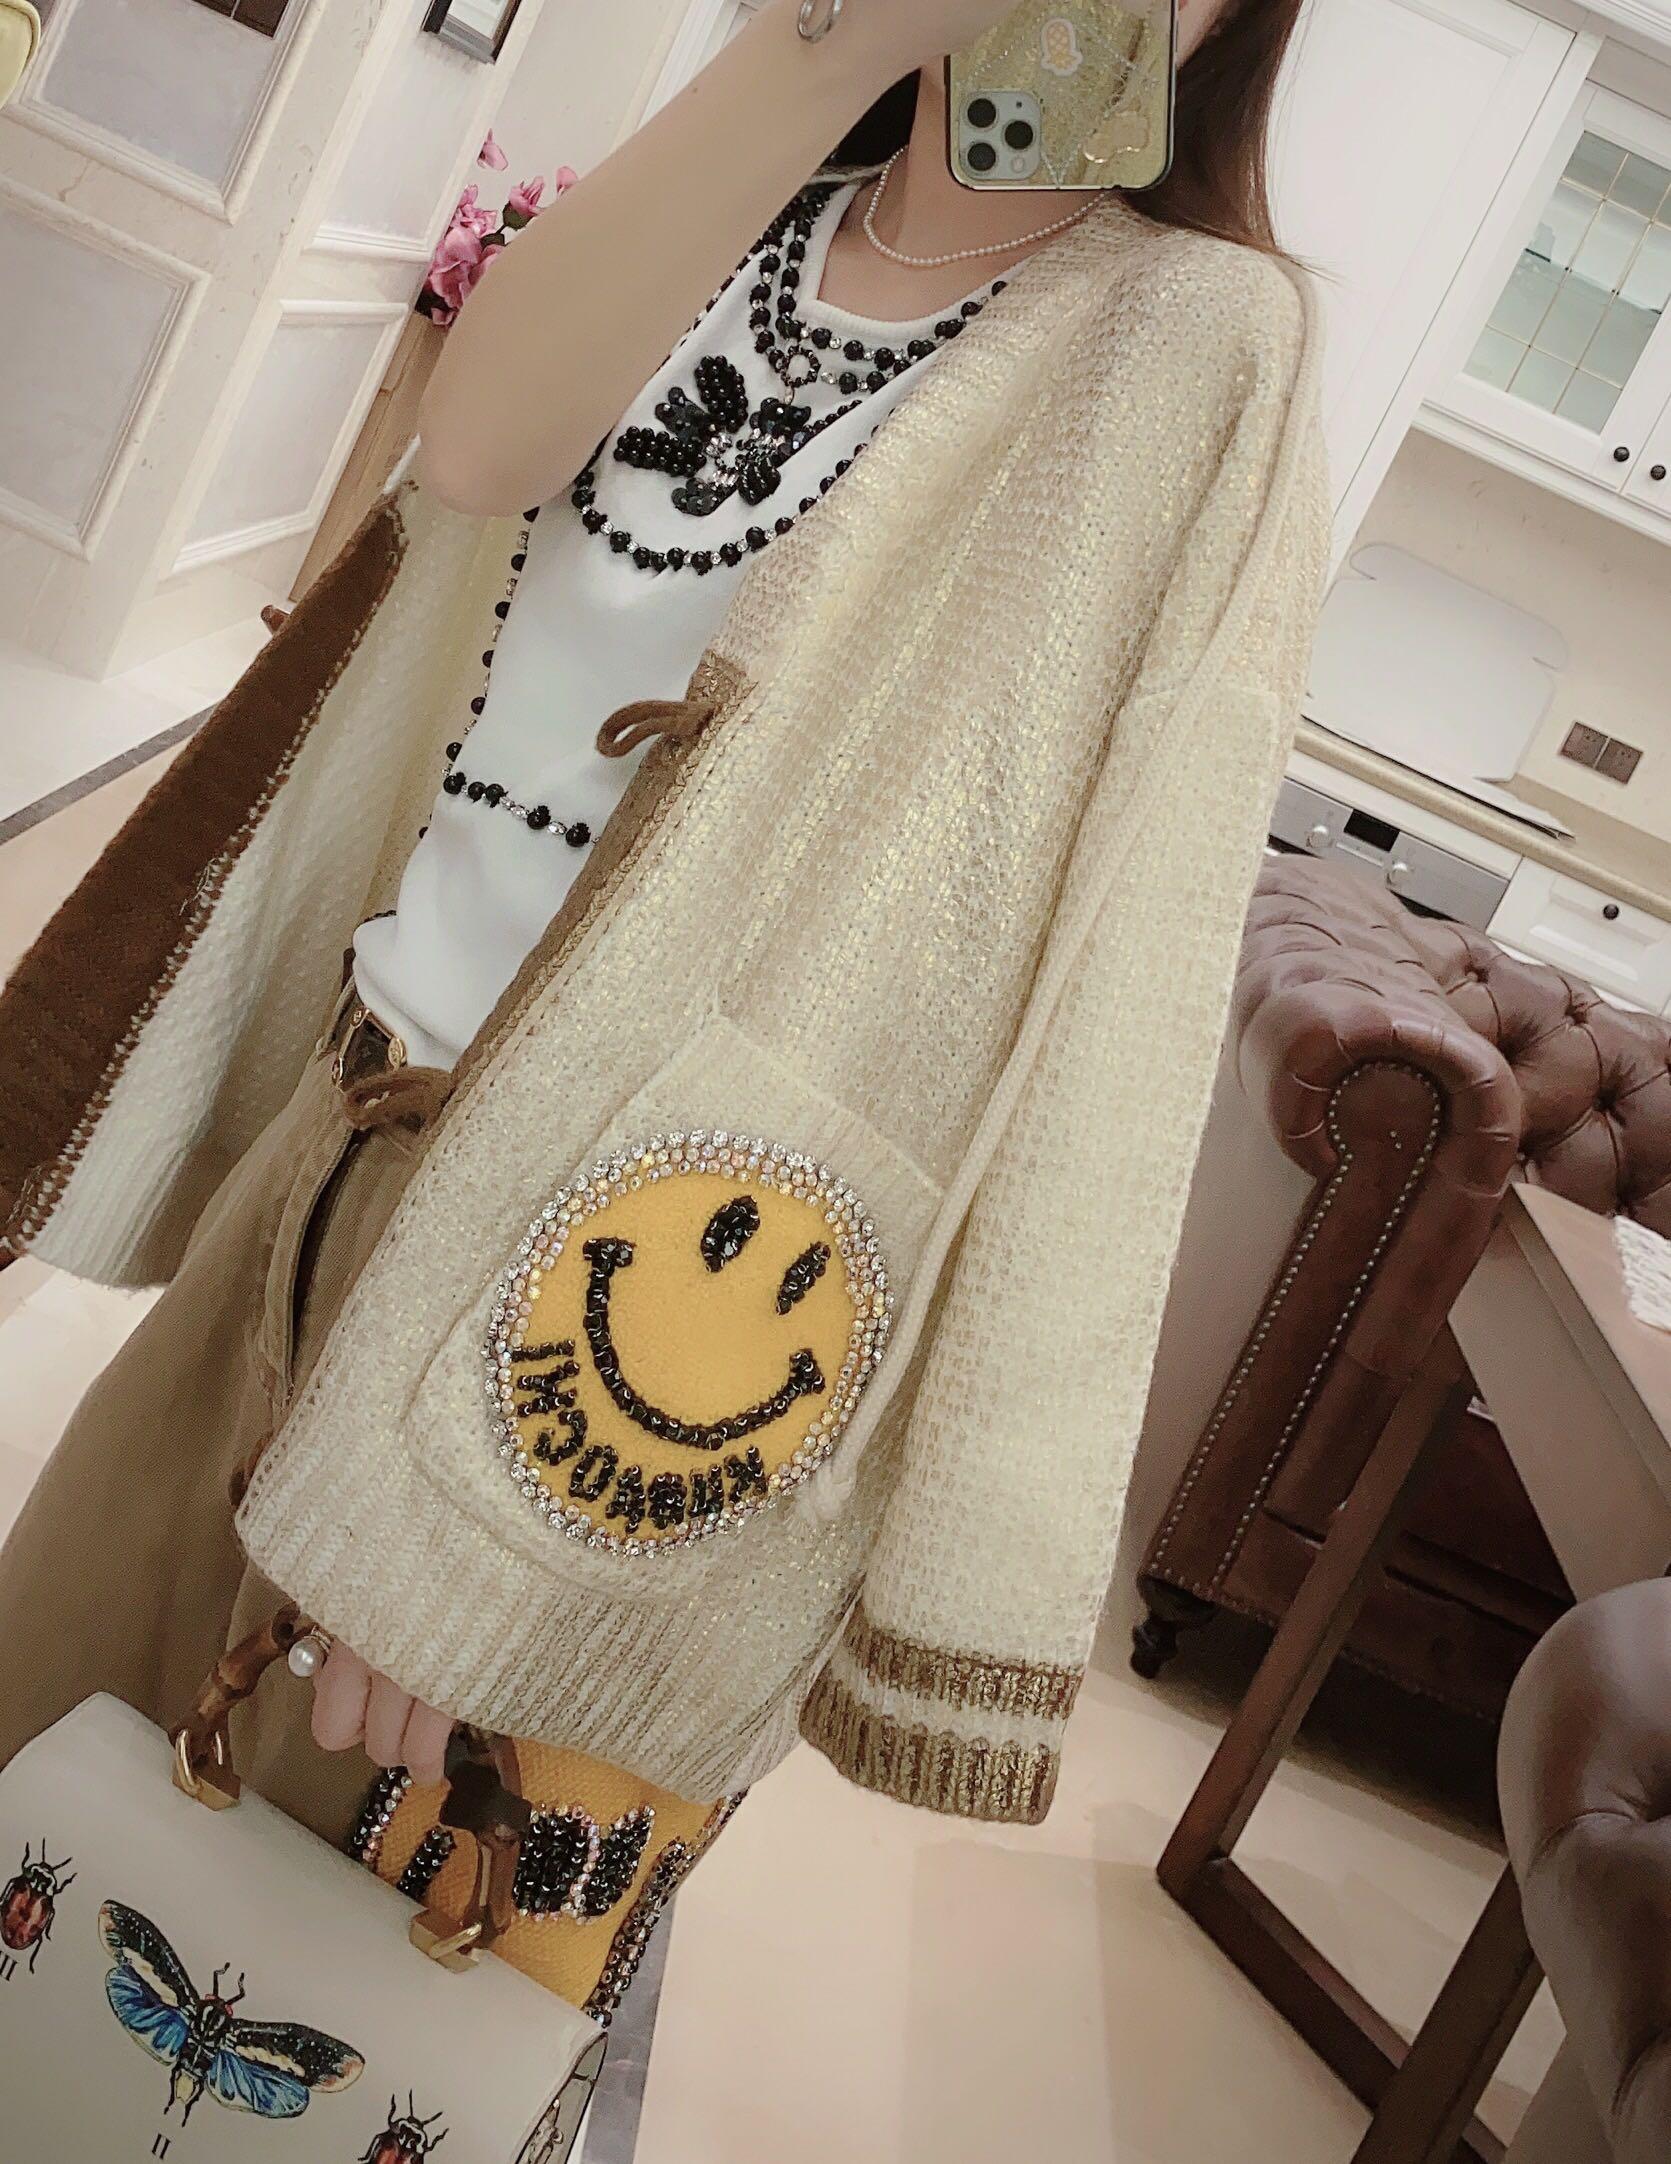 Europe station European smiling face sweater / smiling face Pants / fragrance bottomed vest Beige gold pattern sweater coat